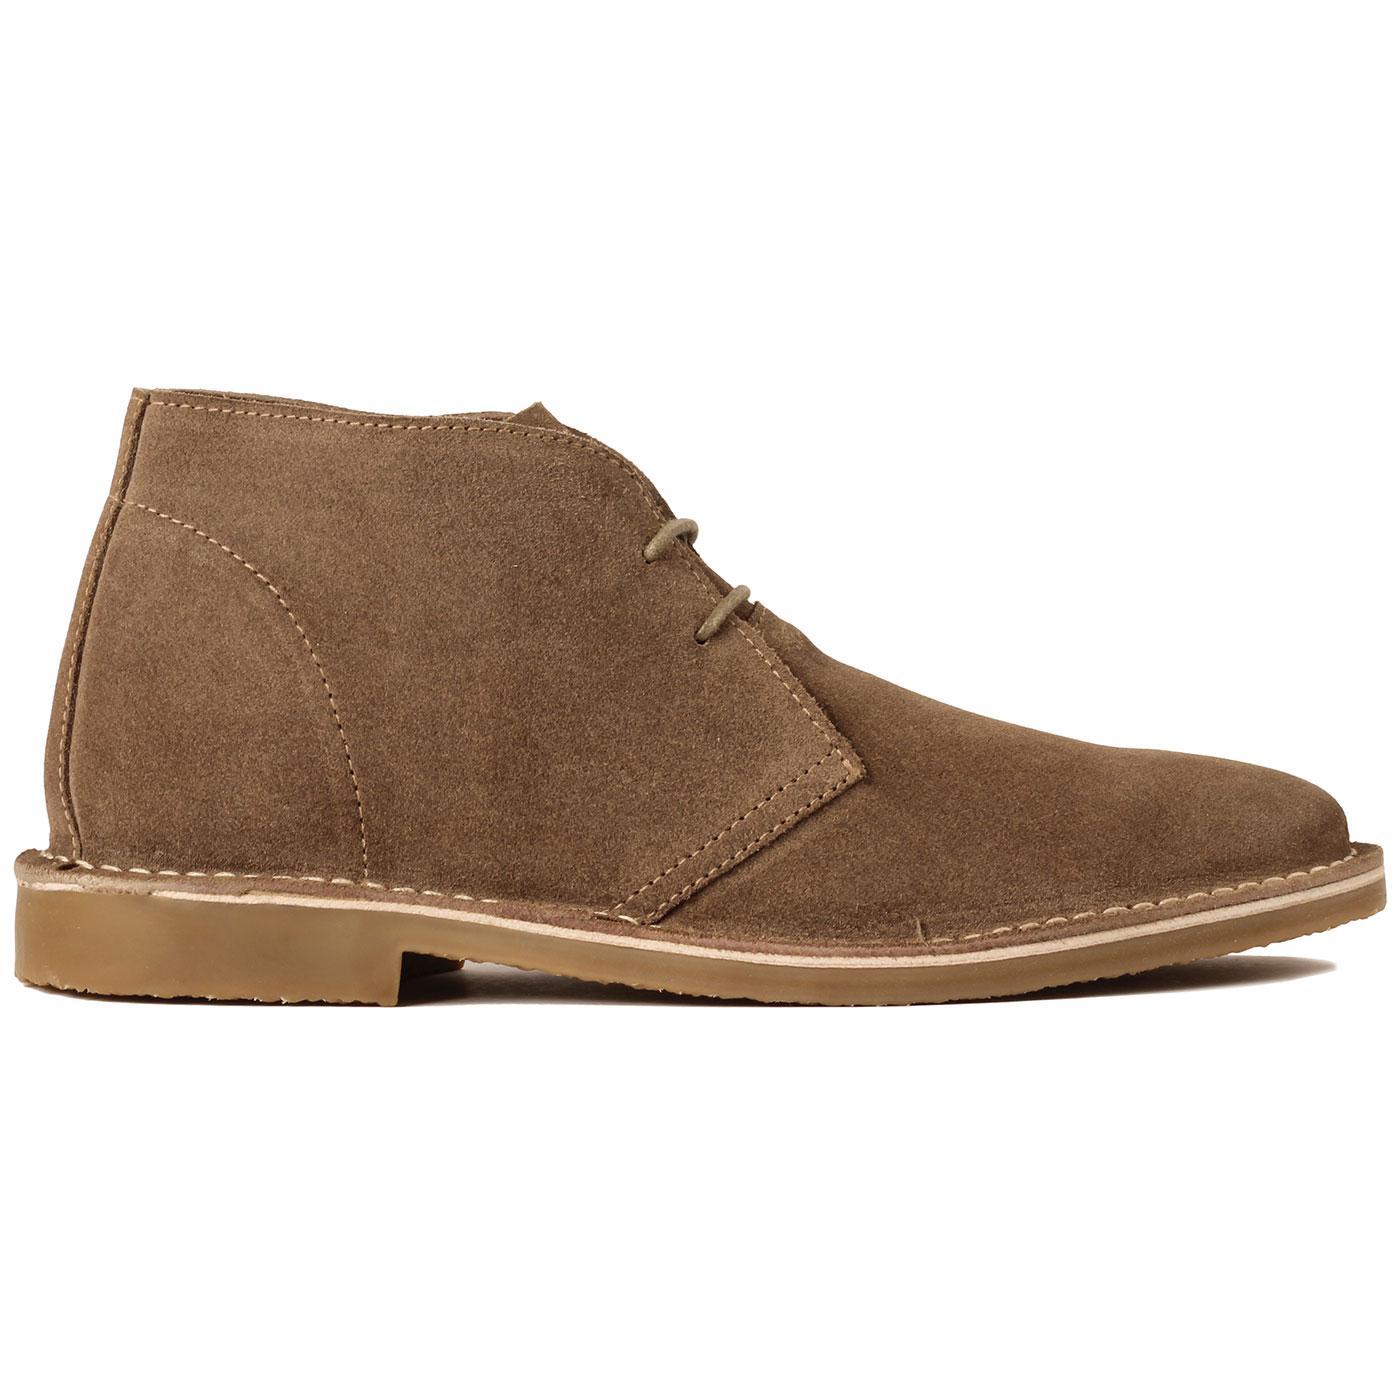 Meaden MADCAP ENGLAND Mod Suede Desert Boots BROWN